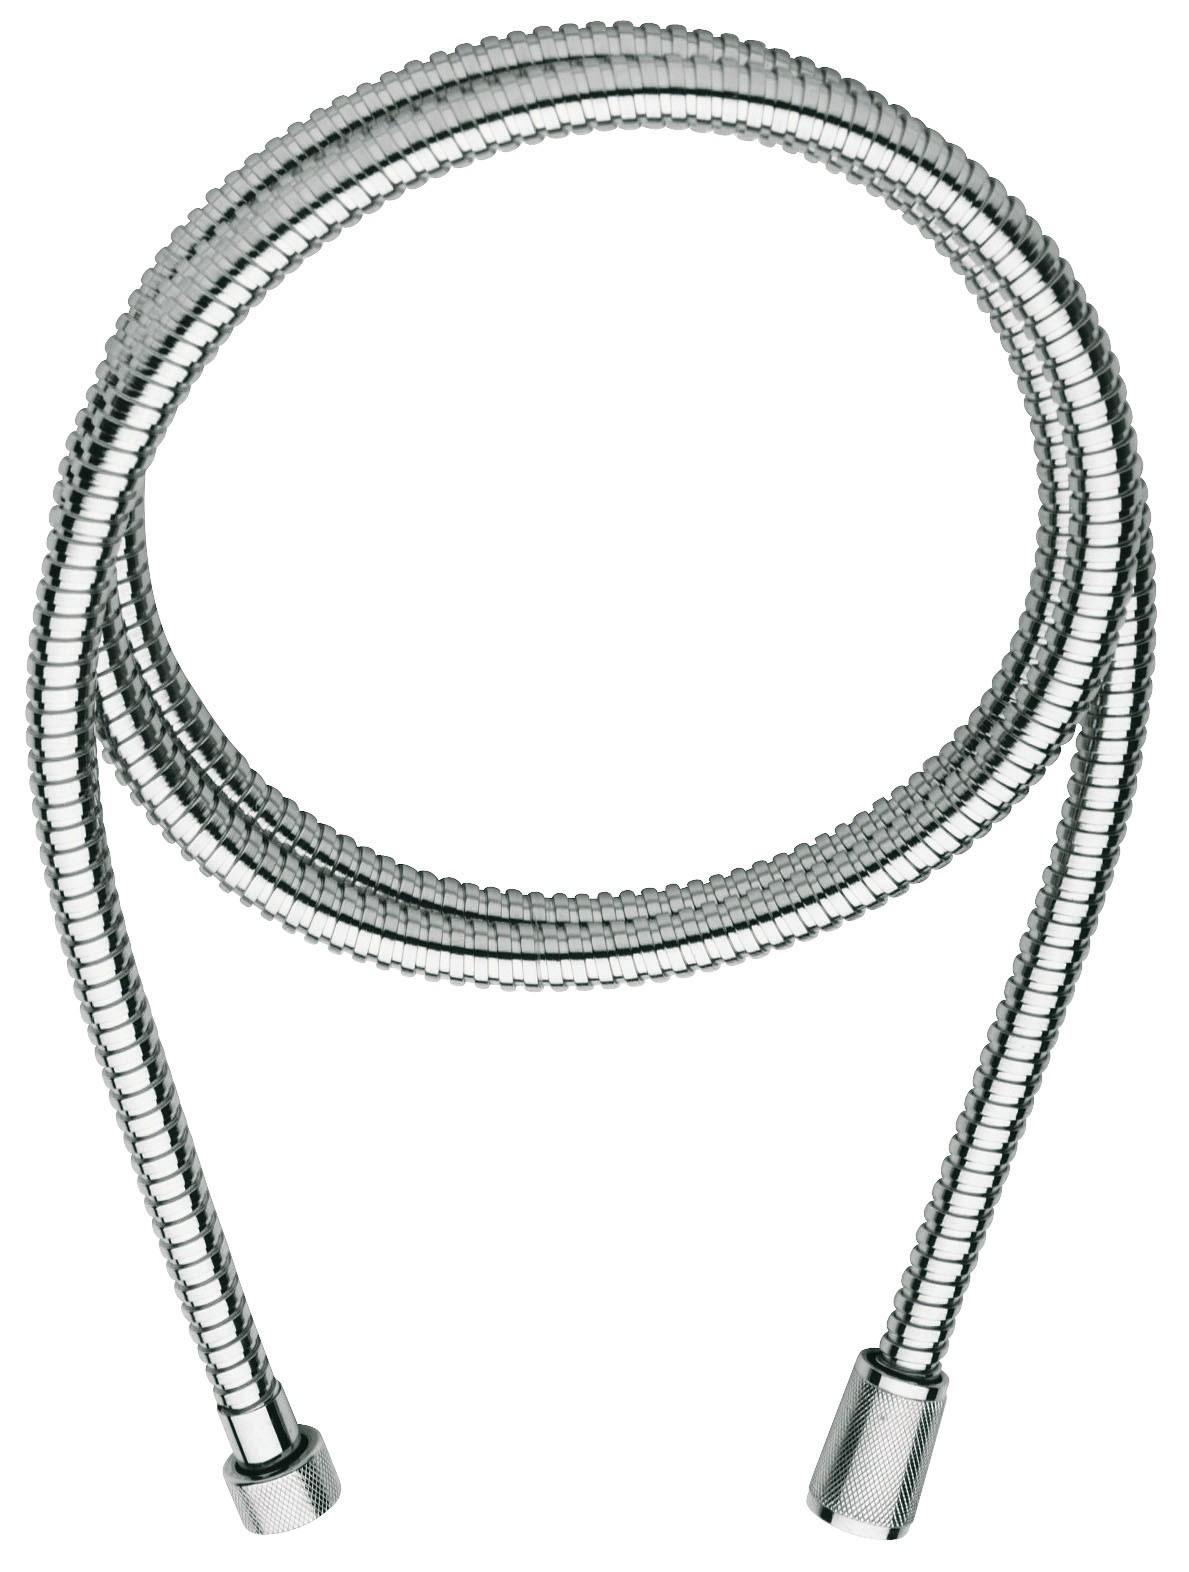 Душевой шланг Grohe 28140000 Relexa металлический, 2000 мм, хром